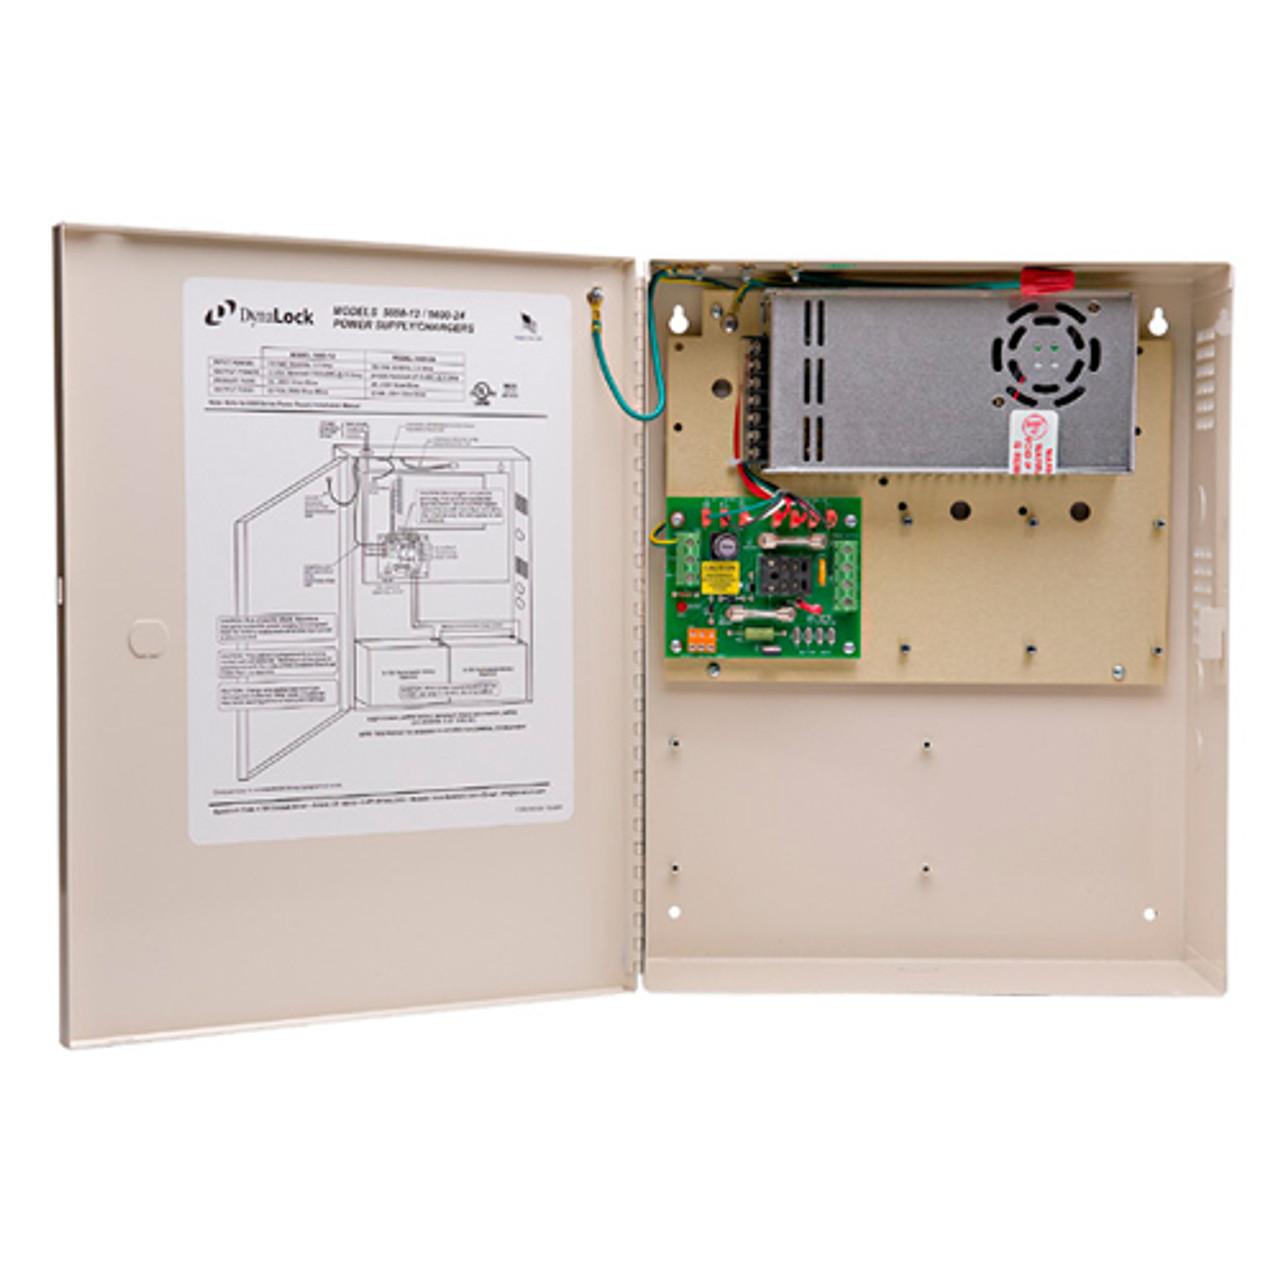 5600-12-KLC DynaLock Multi Zone Heavy Duty 12 VDC Power Supply with Key Locked Cover